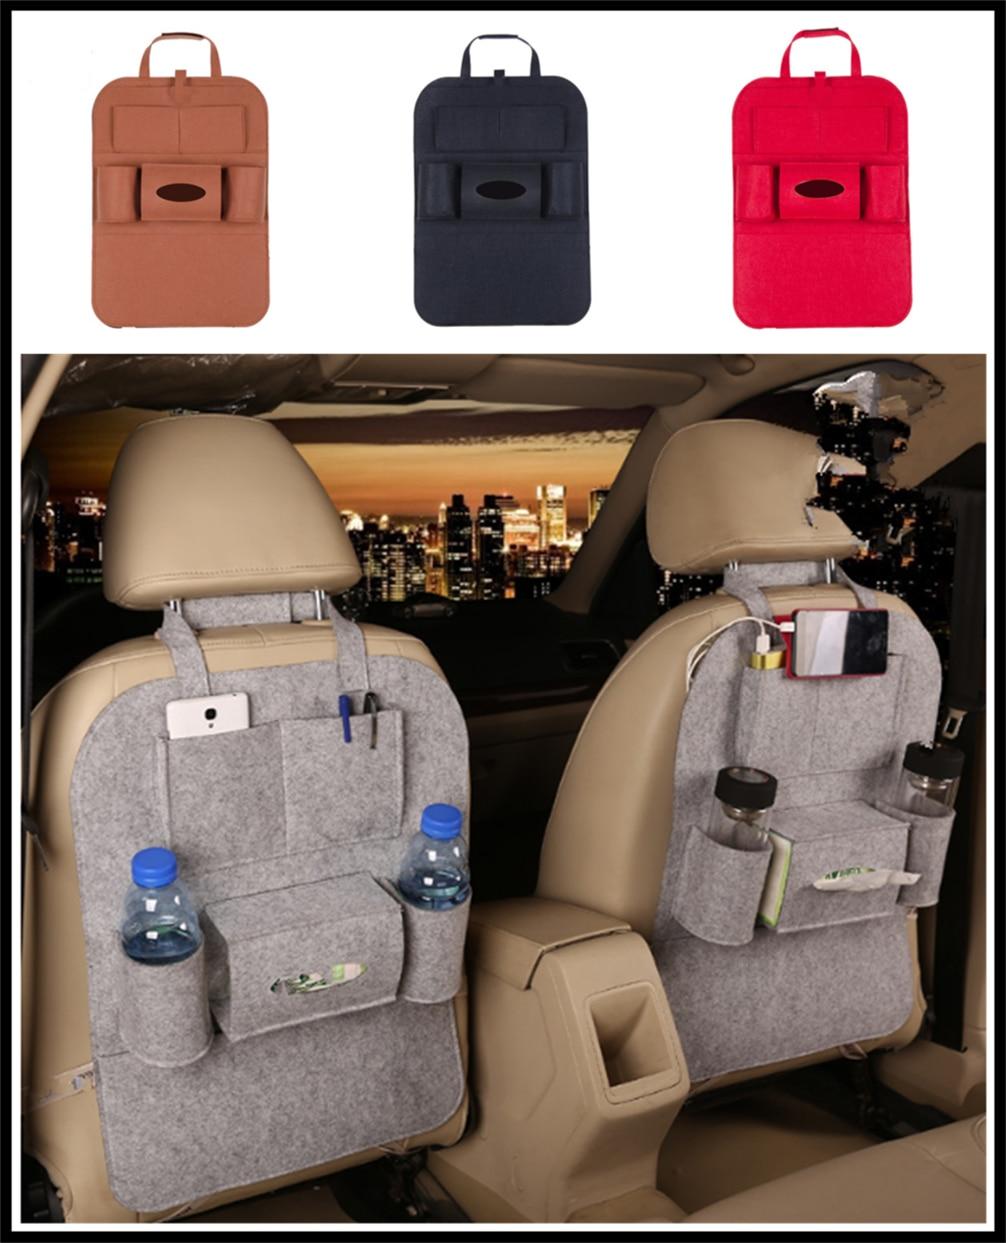 New car interior seat bag storage multi-port finishing debris rack for Opel Astra g/gtc/j/h Corsa Antara Meriva Zafira Mokka